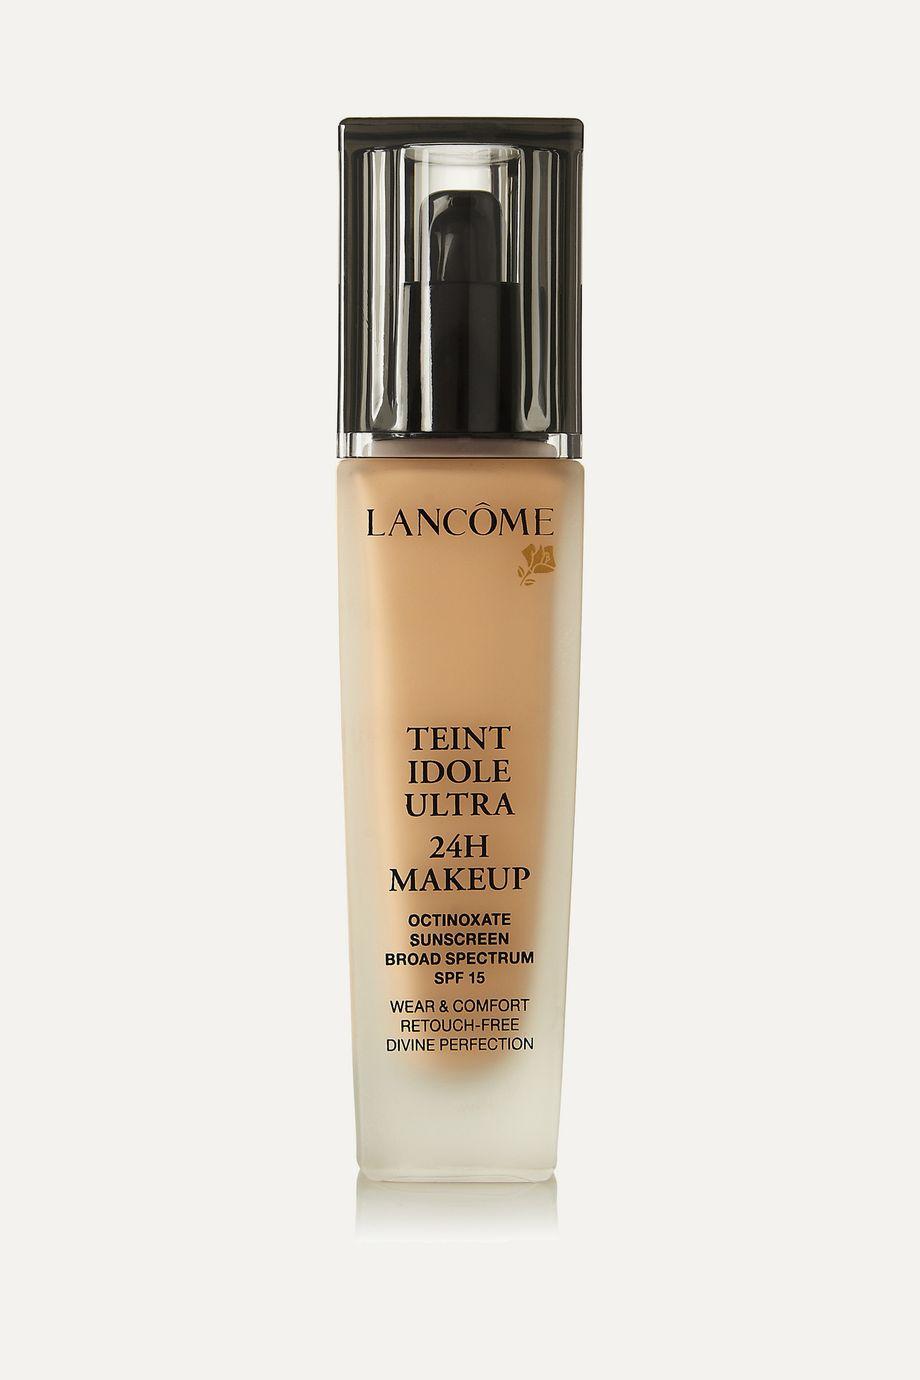 Lancôme Teint Idole Ultra 24H Liquid Foundation - 430 Bisque C, 30ml